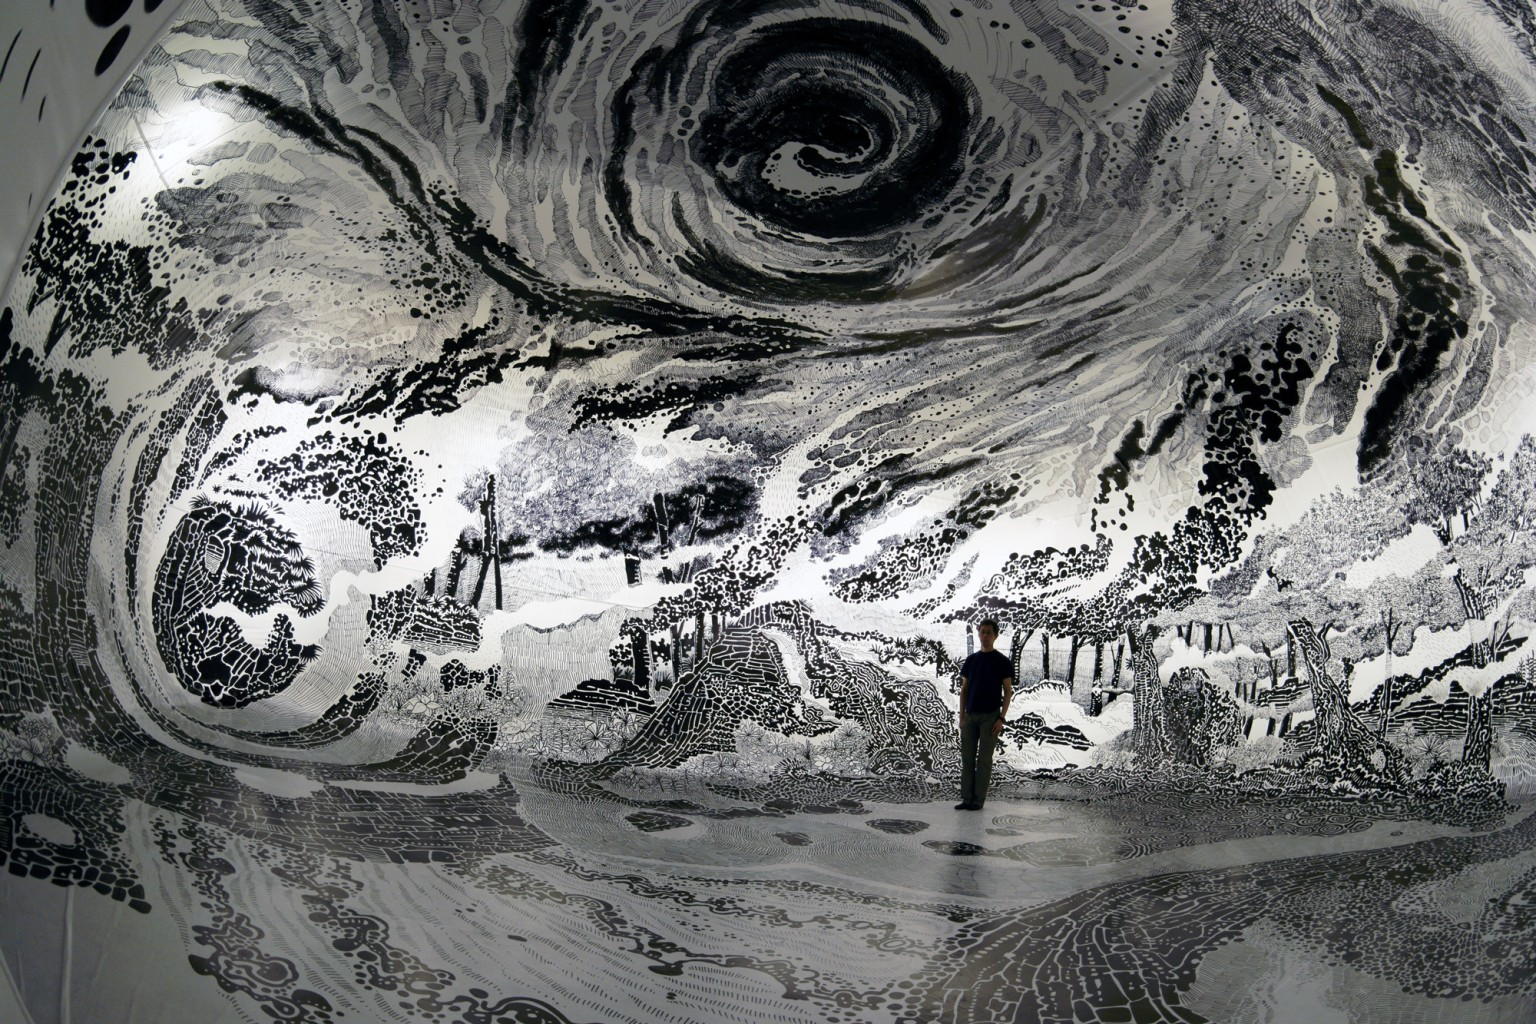 Drawing in Ephemeral, the 360-degree immersive world of Oscar Oiwa